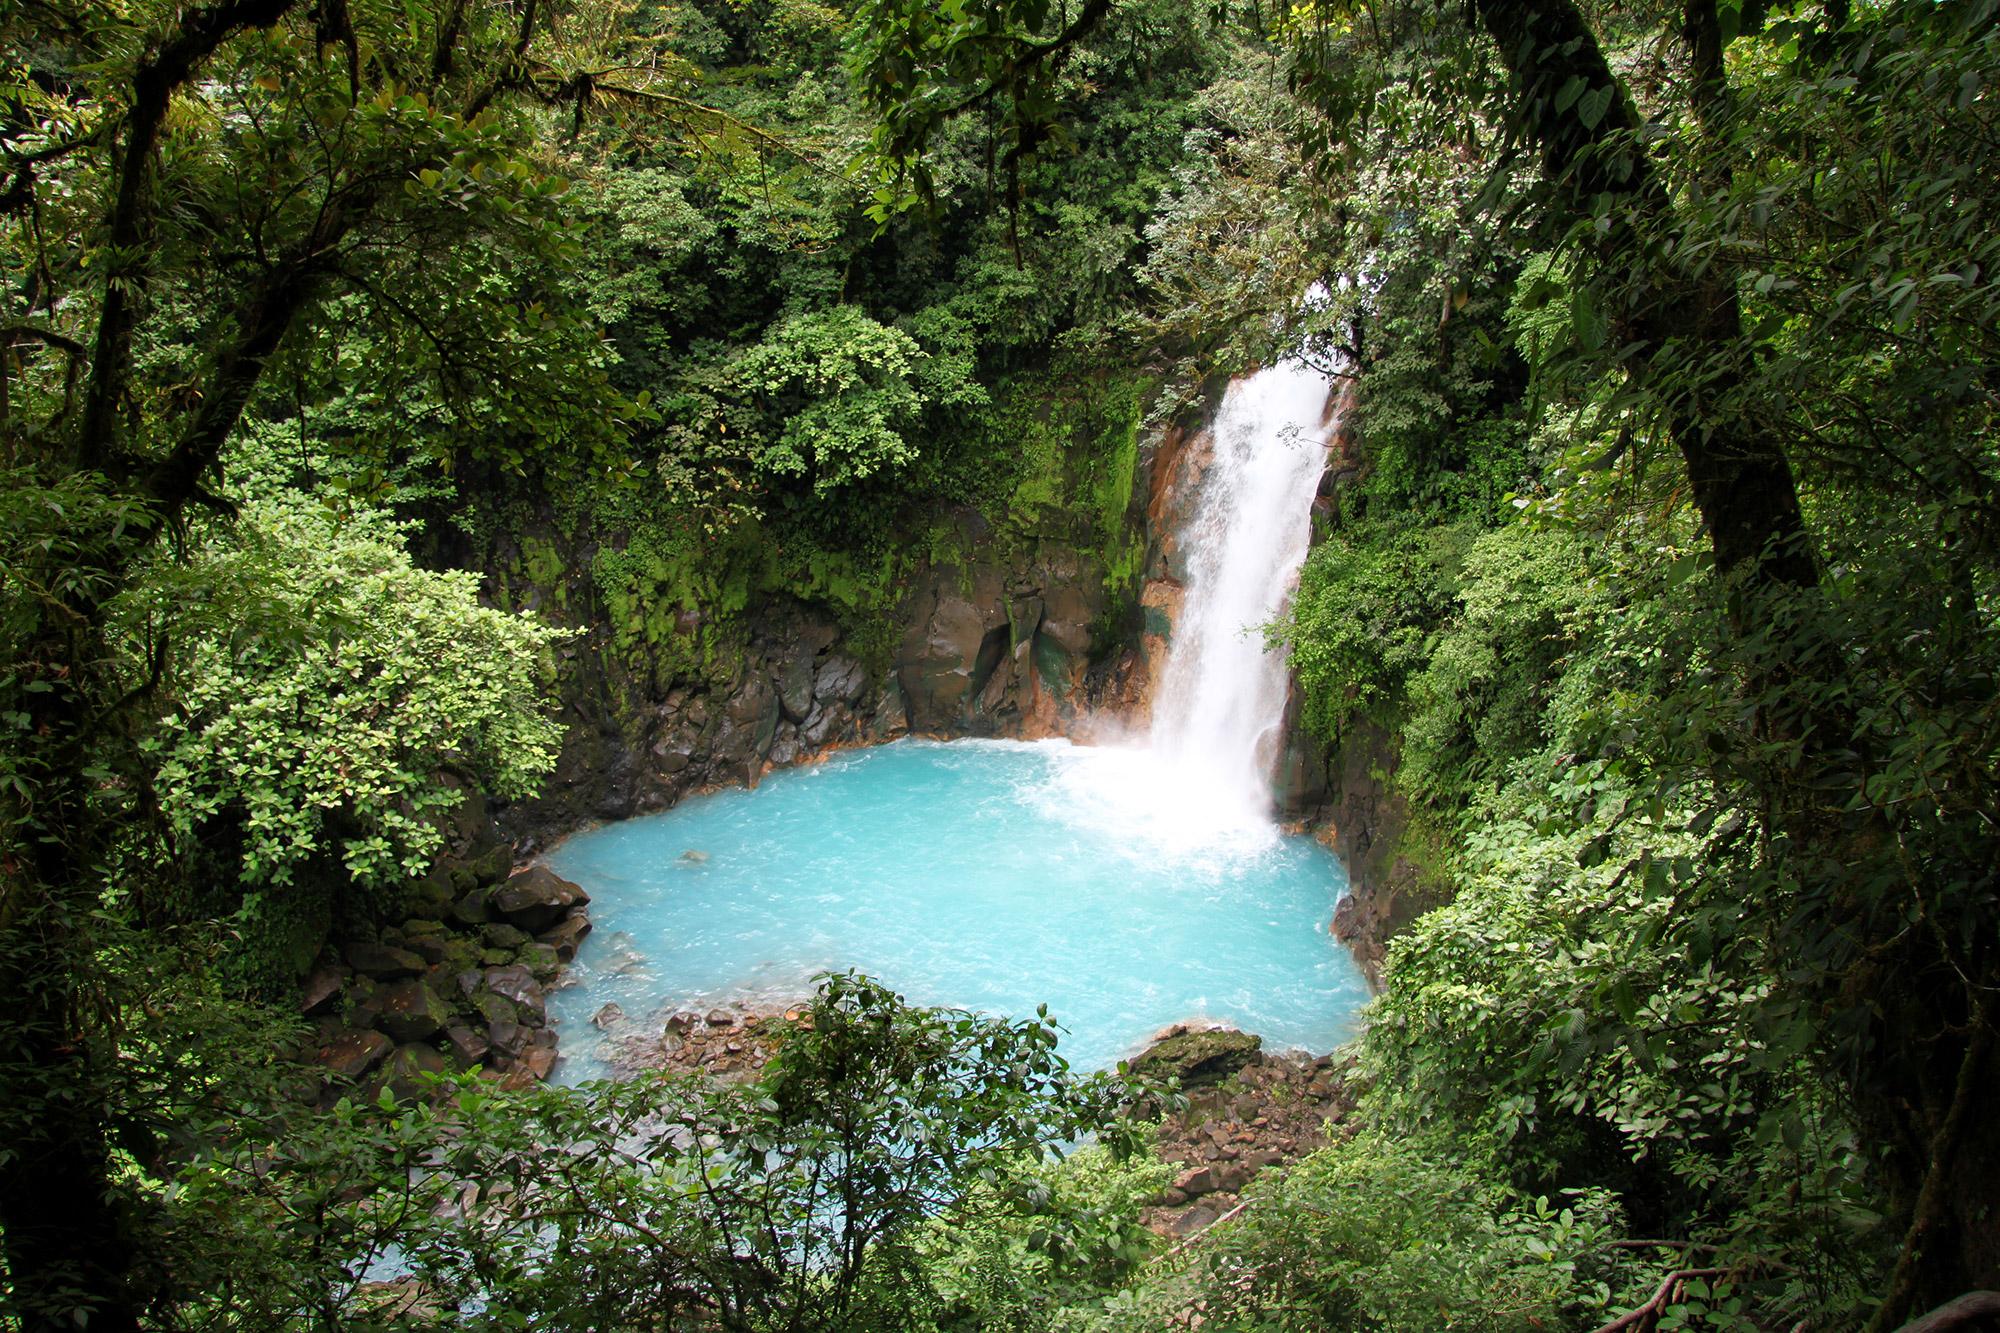 Onze favoriete nationale parken van Costa Rica - Parque Nacional Volcán Tenorio